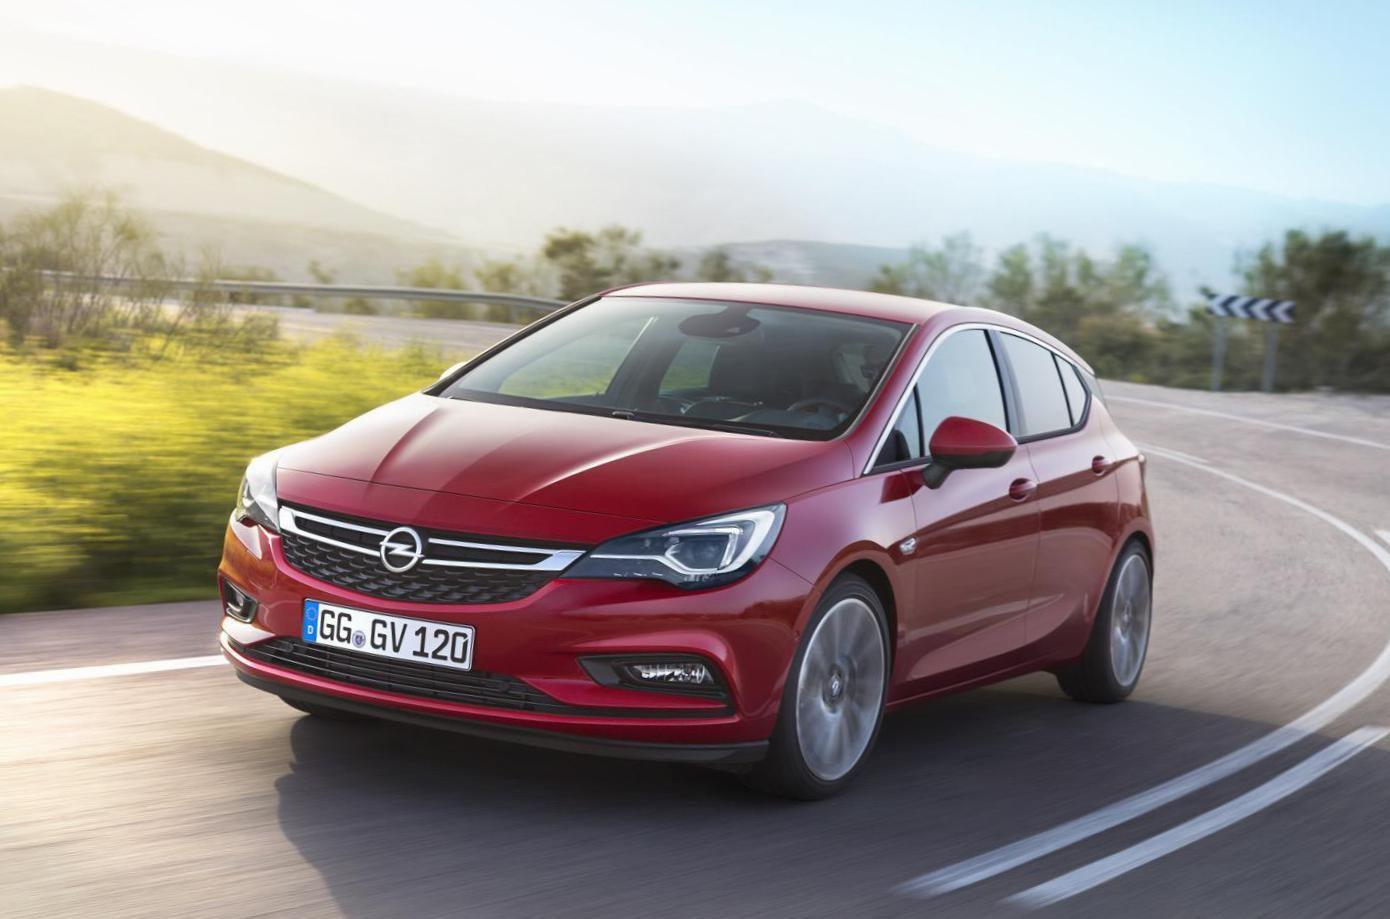 Astra K Hatchback Opel specs - http://autotras.com